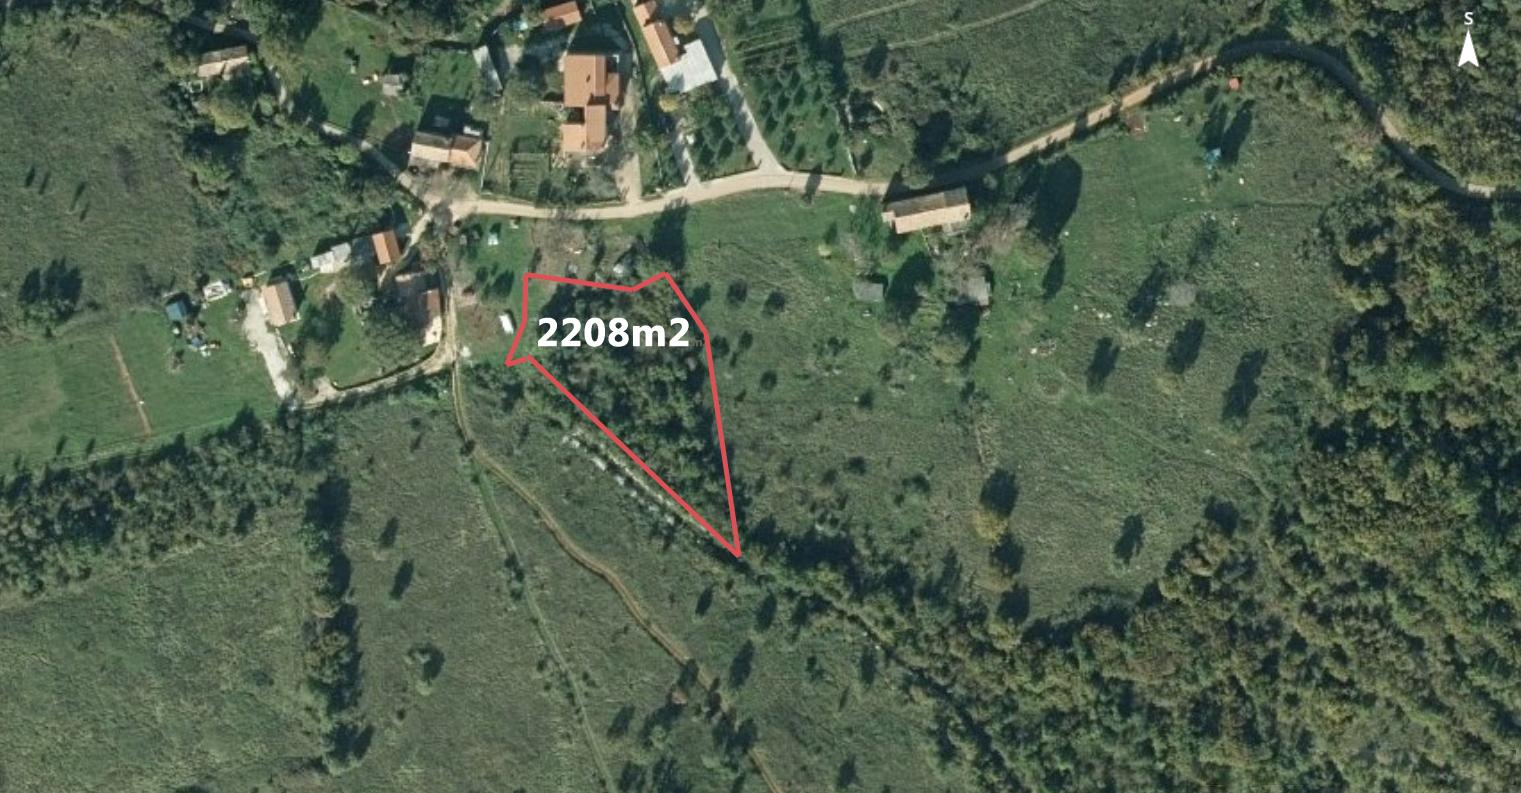 Land Poreč, 2.208m2